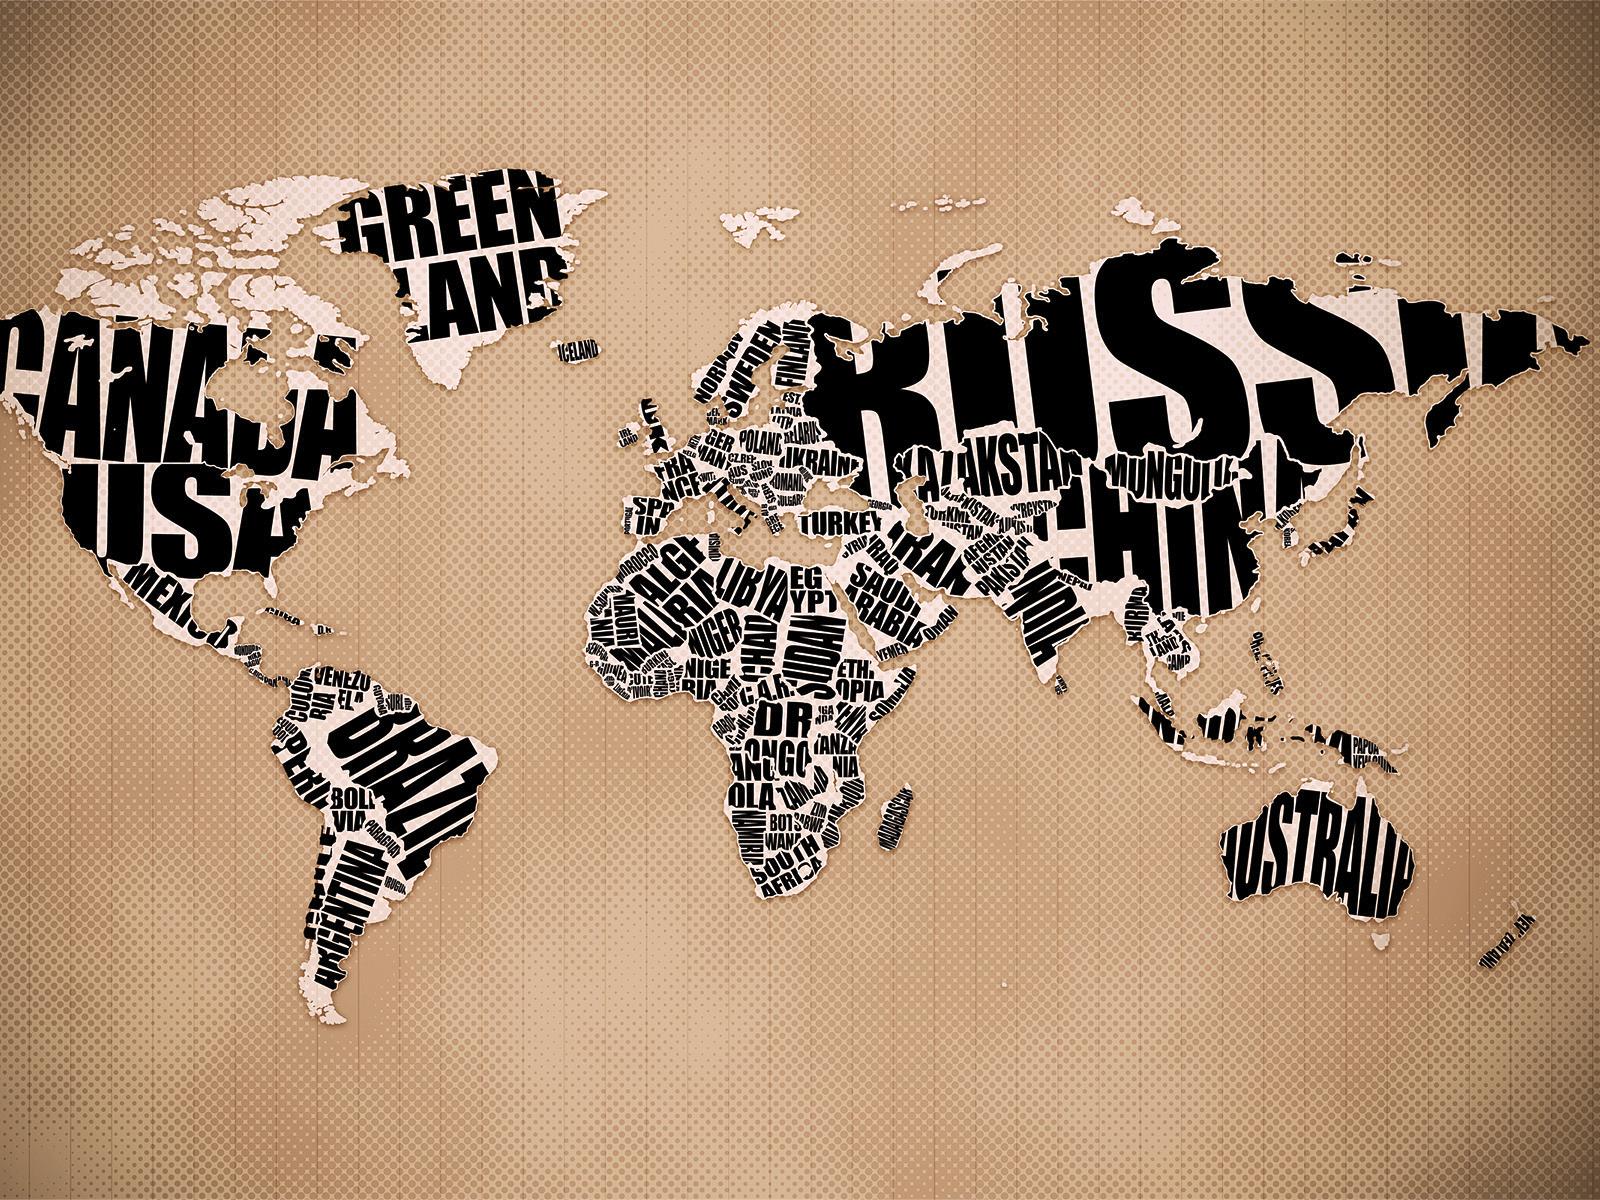 vladstudio_typographic_world_map_1600x1200.jpg